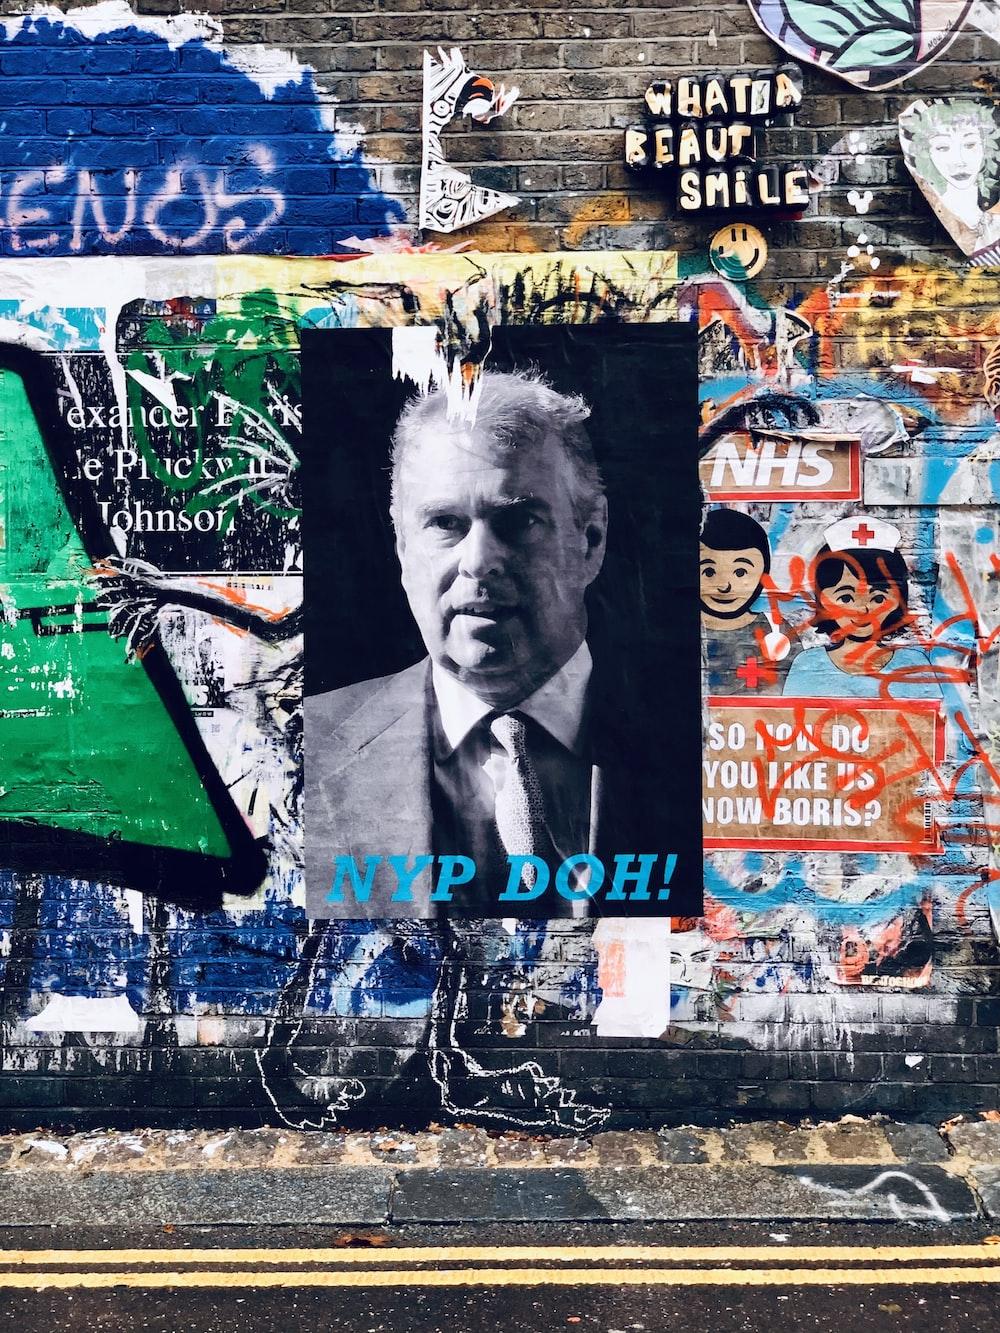 mans face graffiti on wall